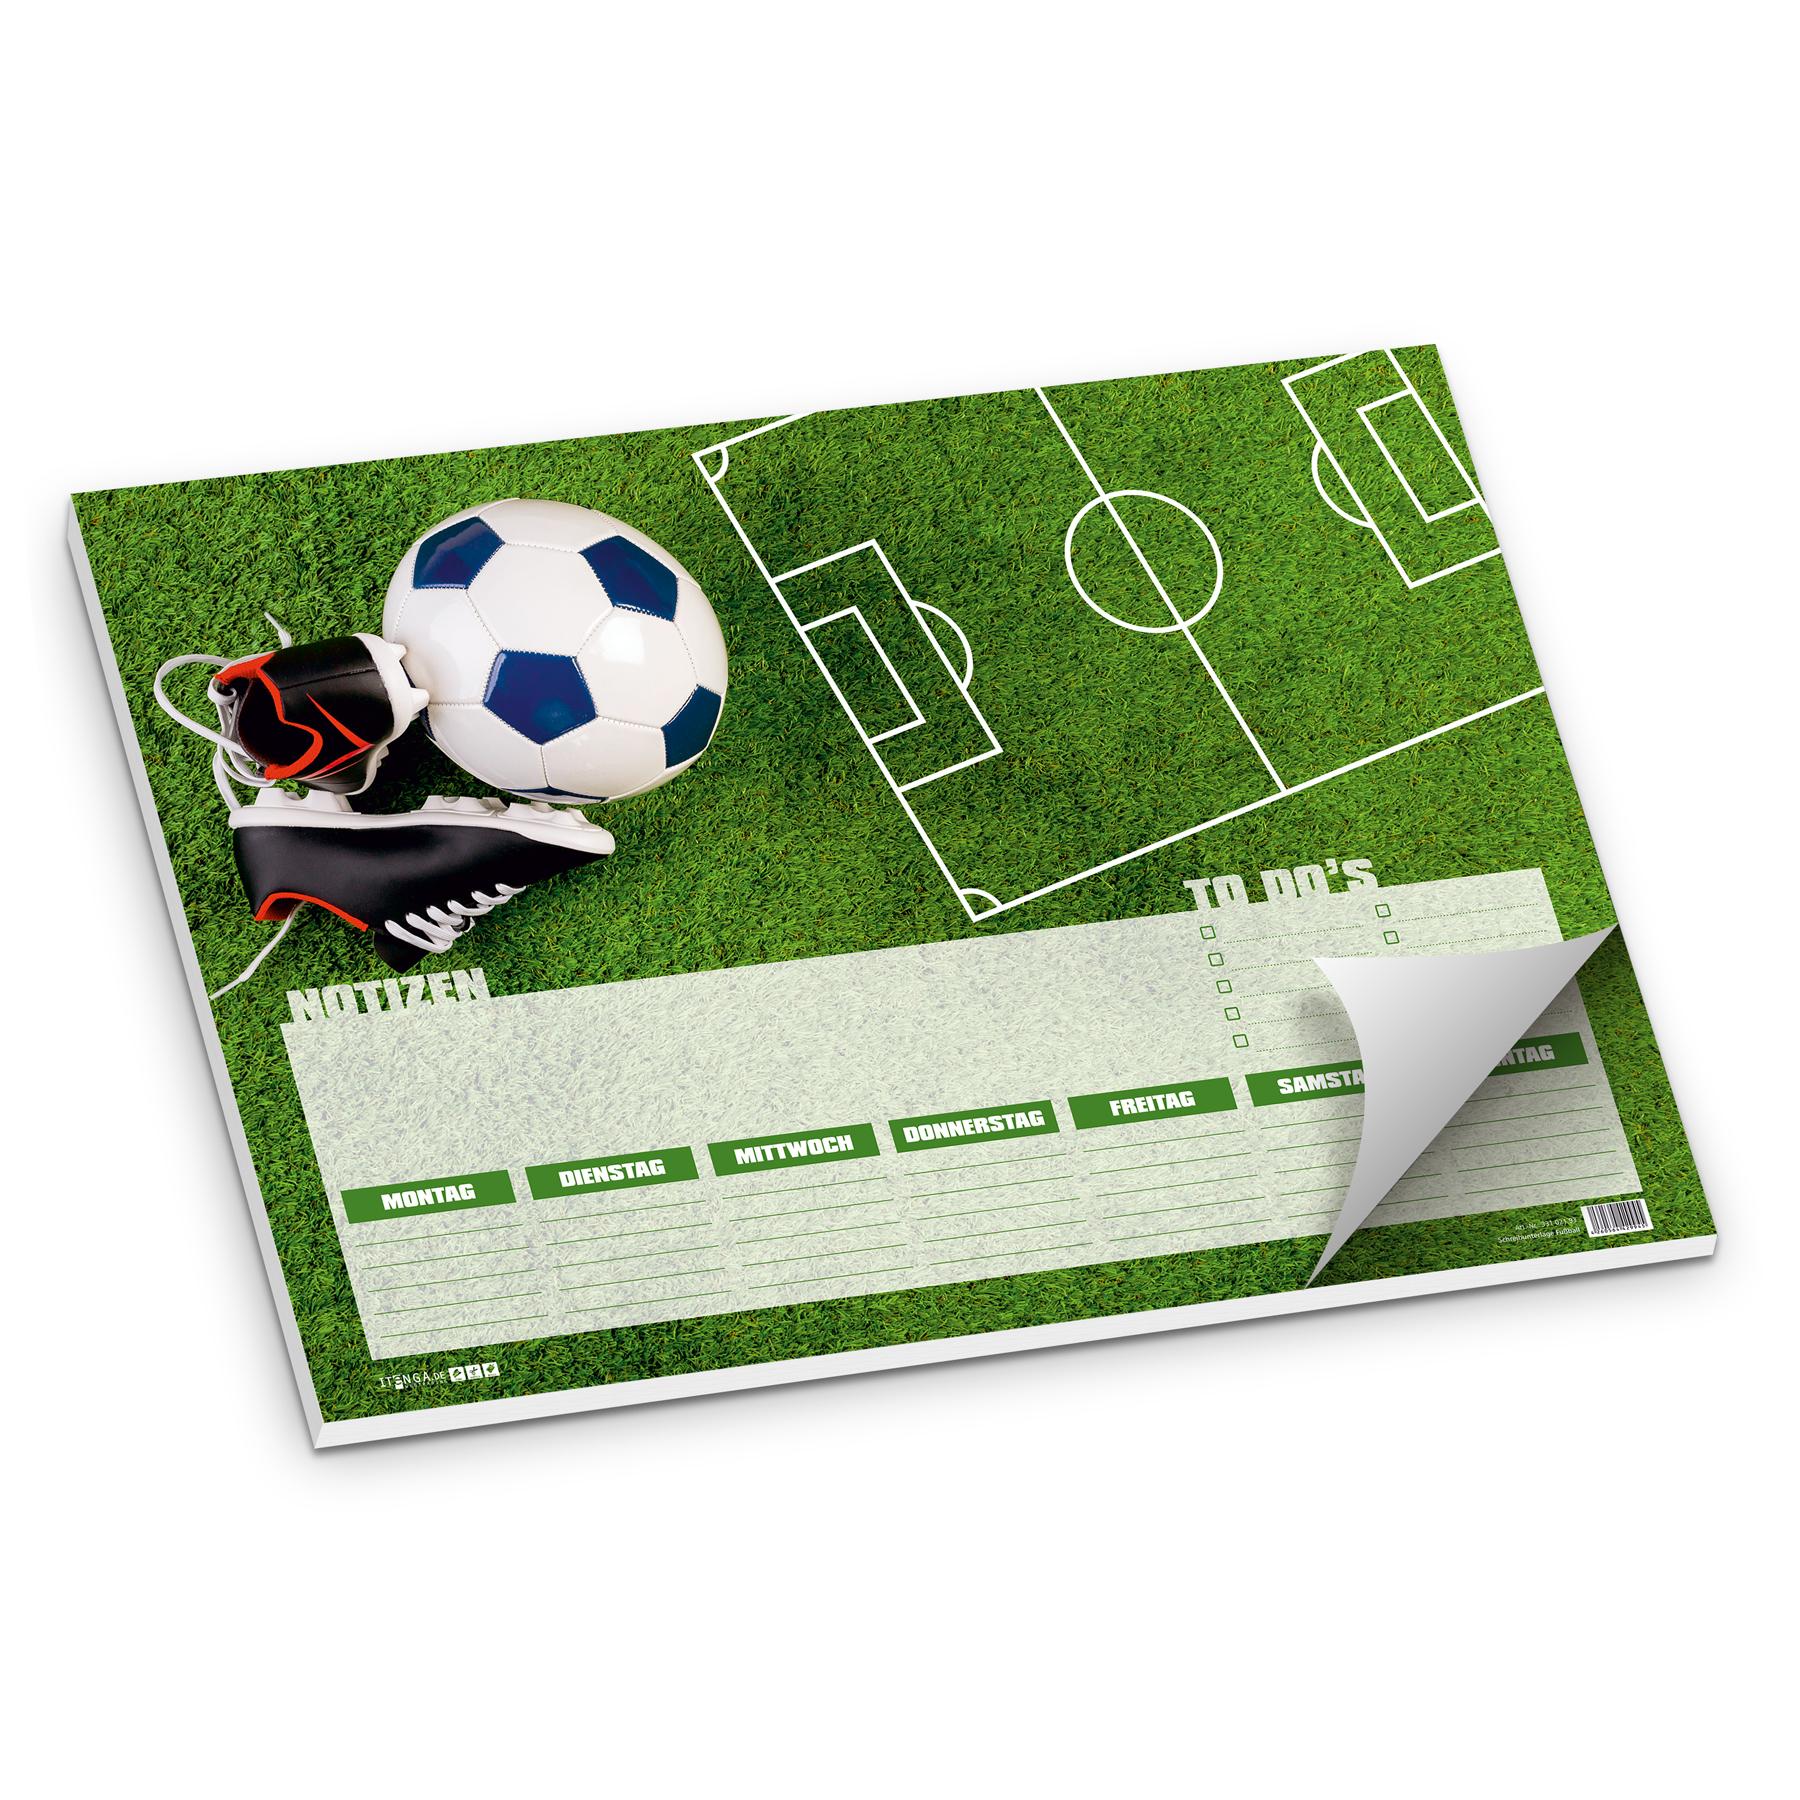 Itenga Schreibtischunterlage Fussball Din A3 50 Blatt